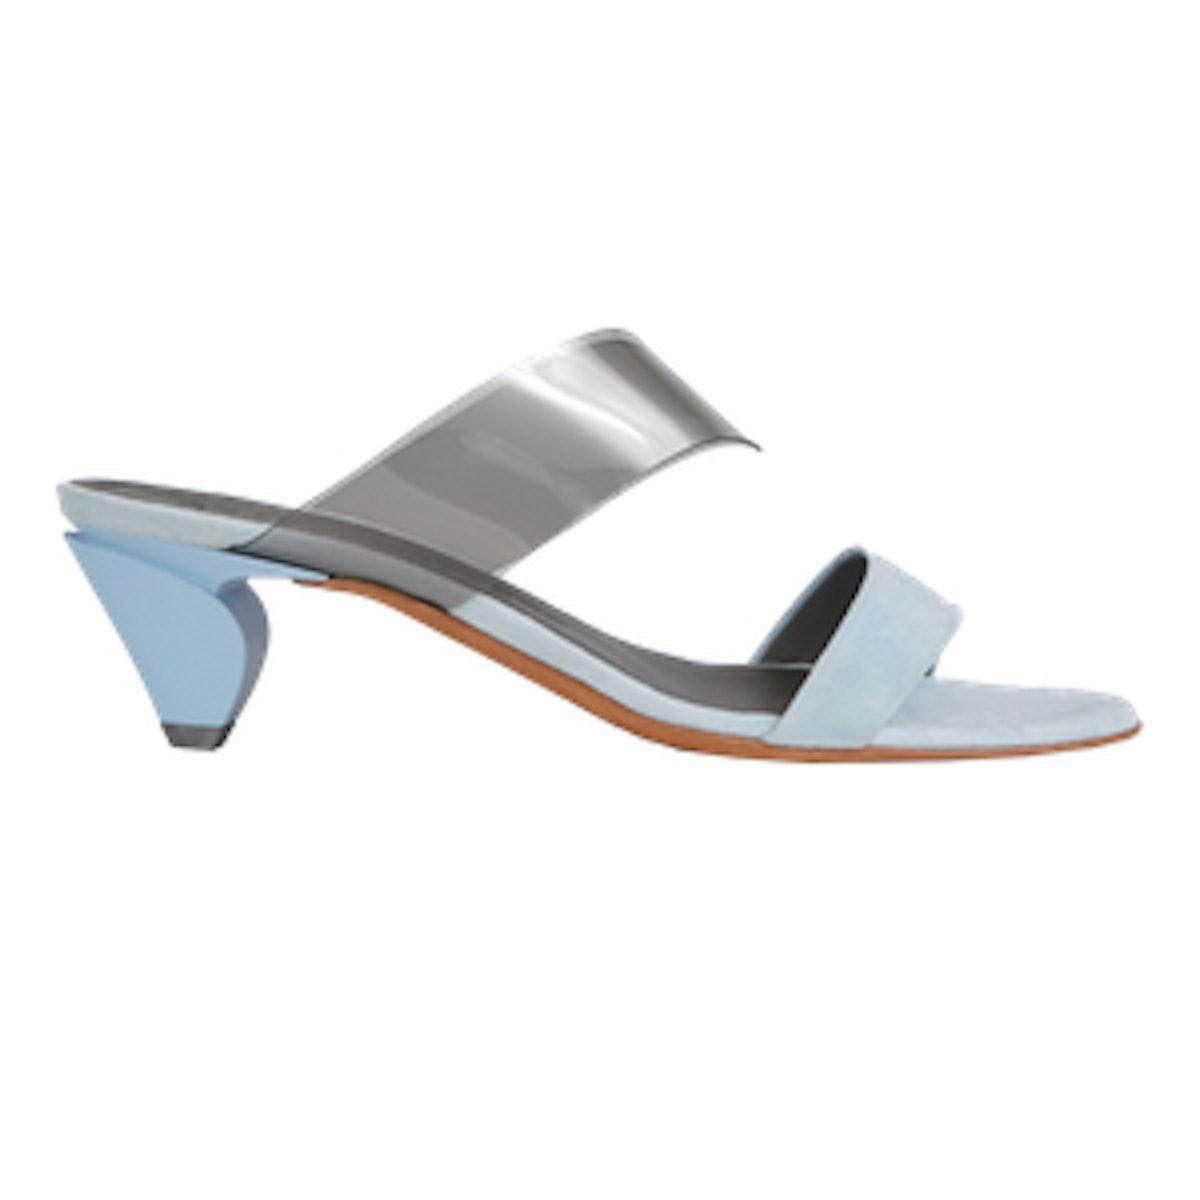 Giada Virgola Azzurro Cielo Sandal